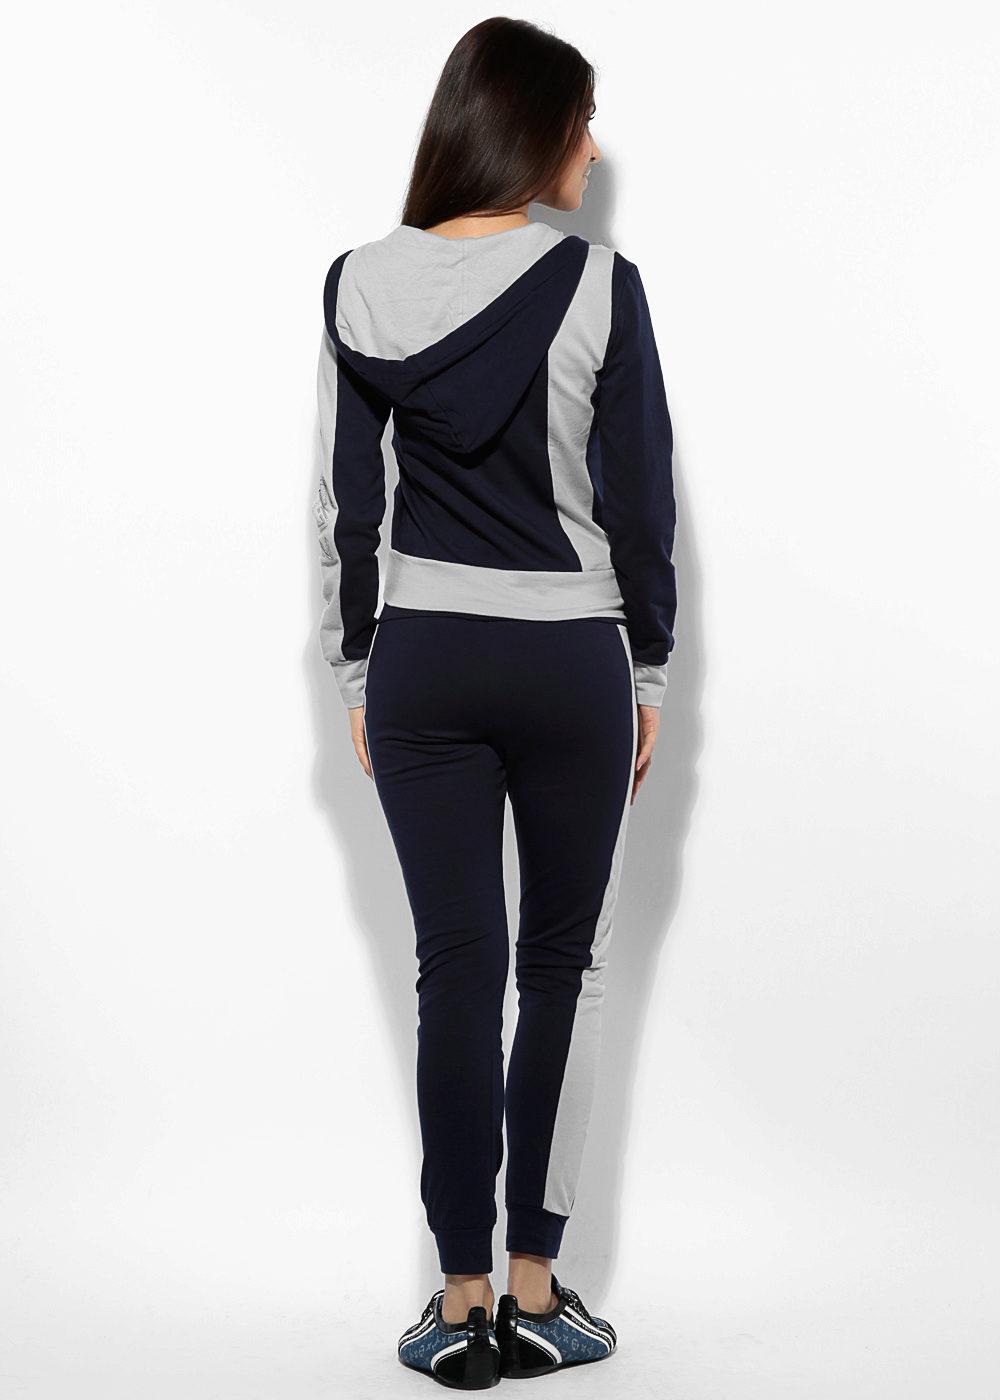 Спортивный костюм армани женский